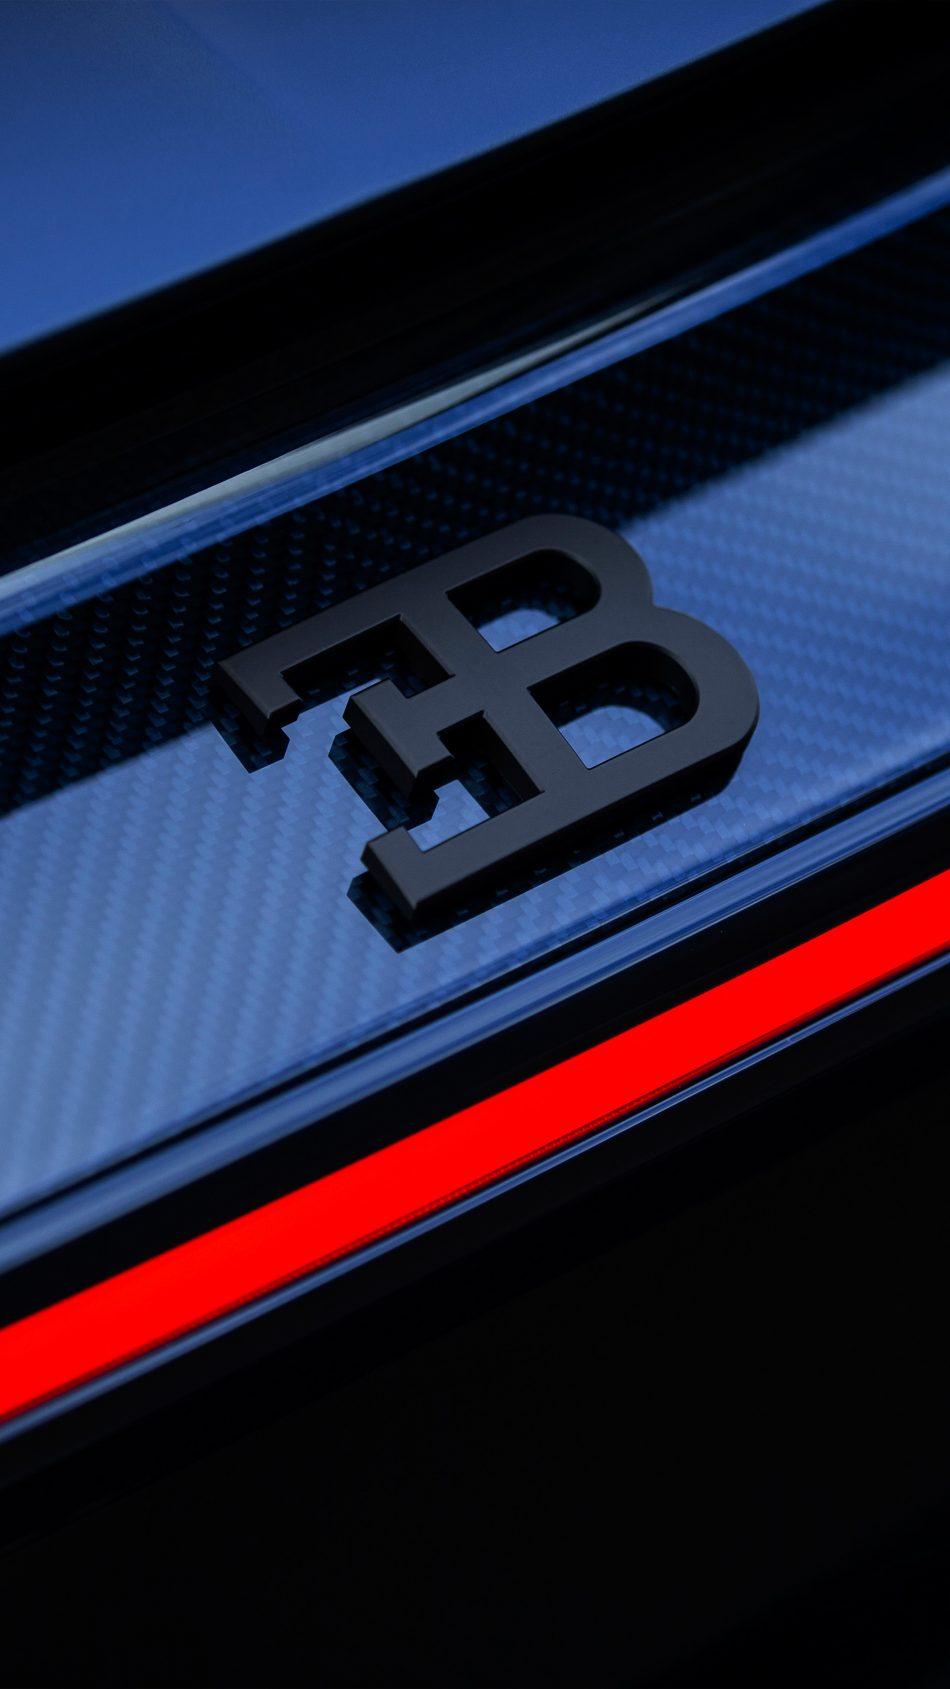 download bugatti logo free